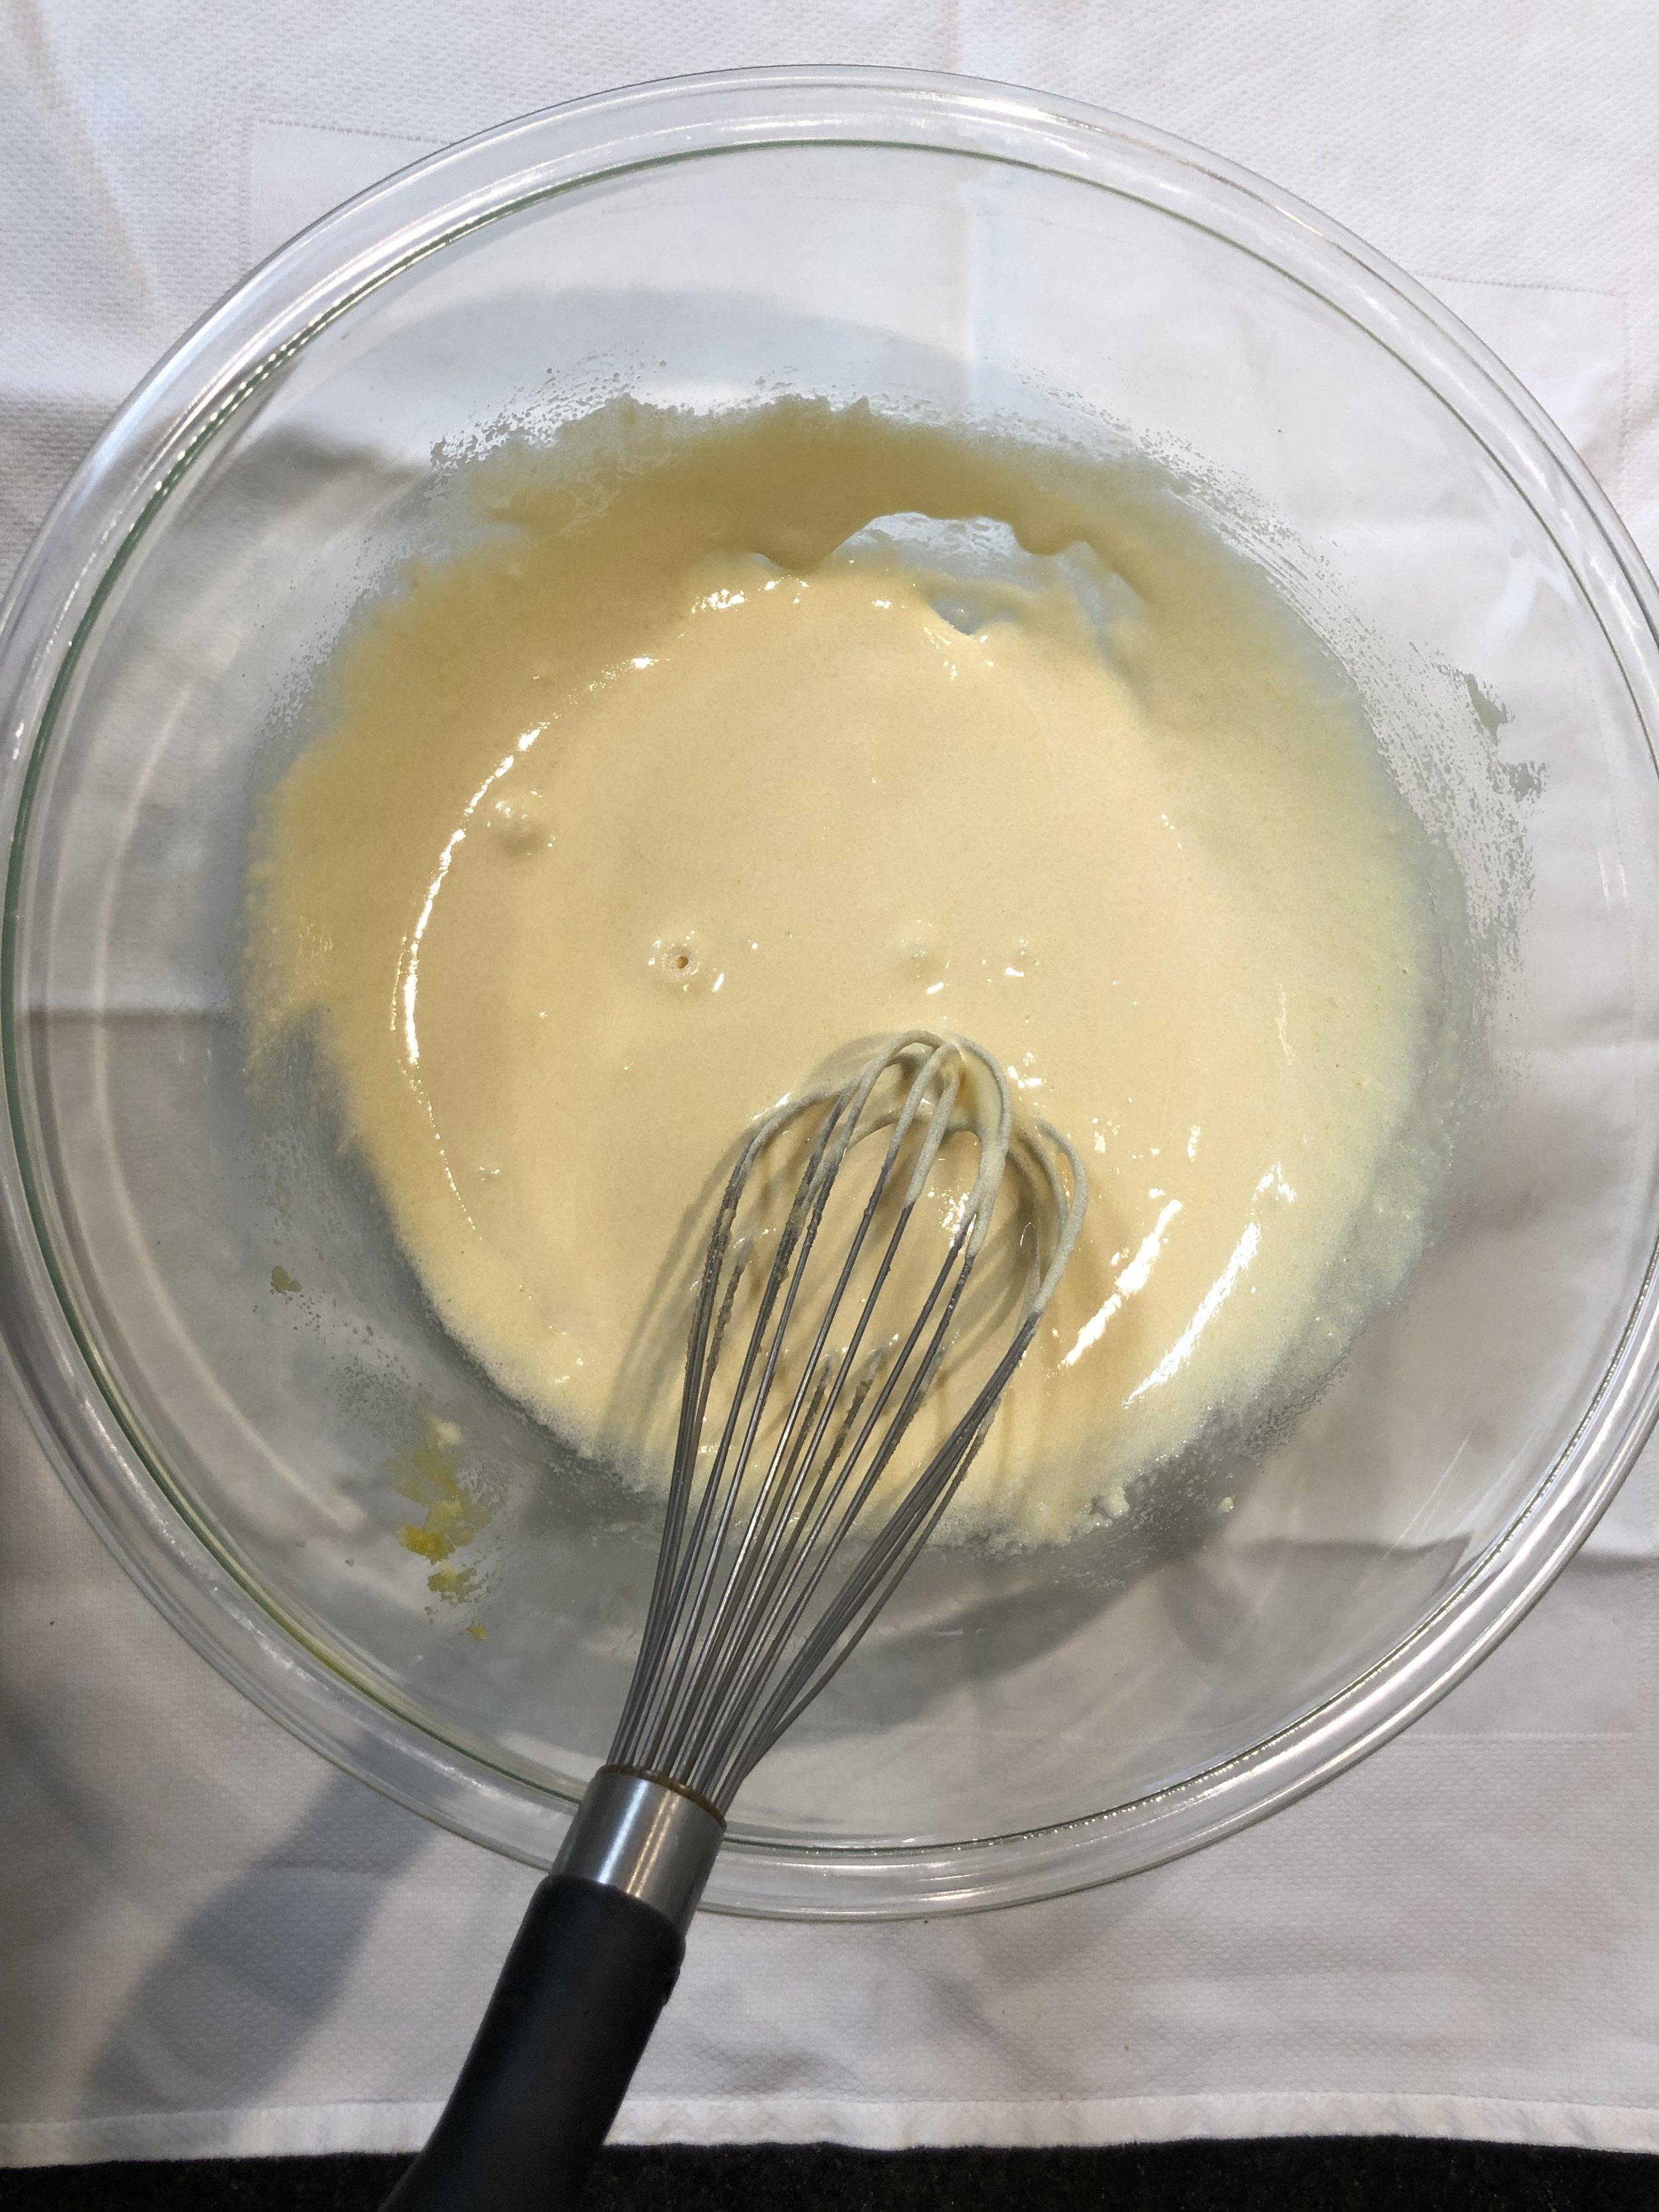 Beat the yolks, sugar, salt, and vanilla, until light and creamy.